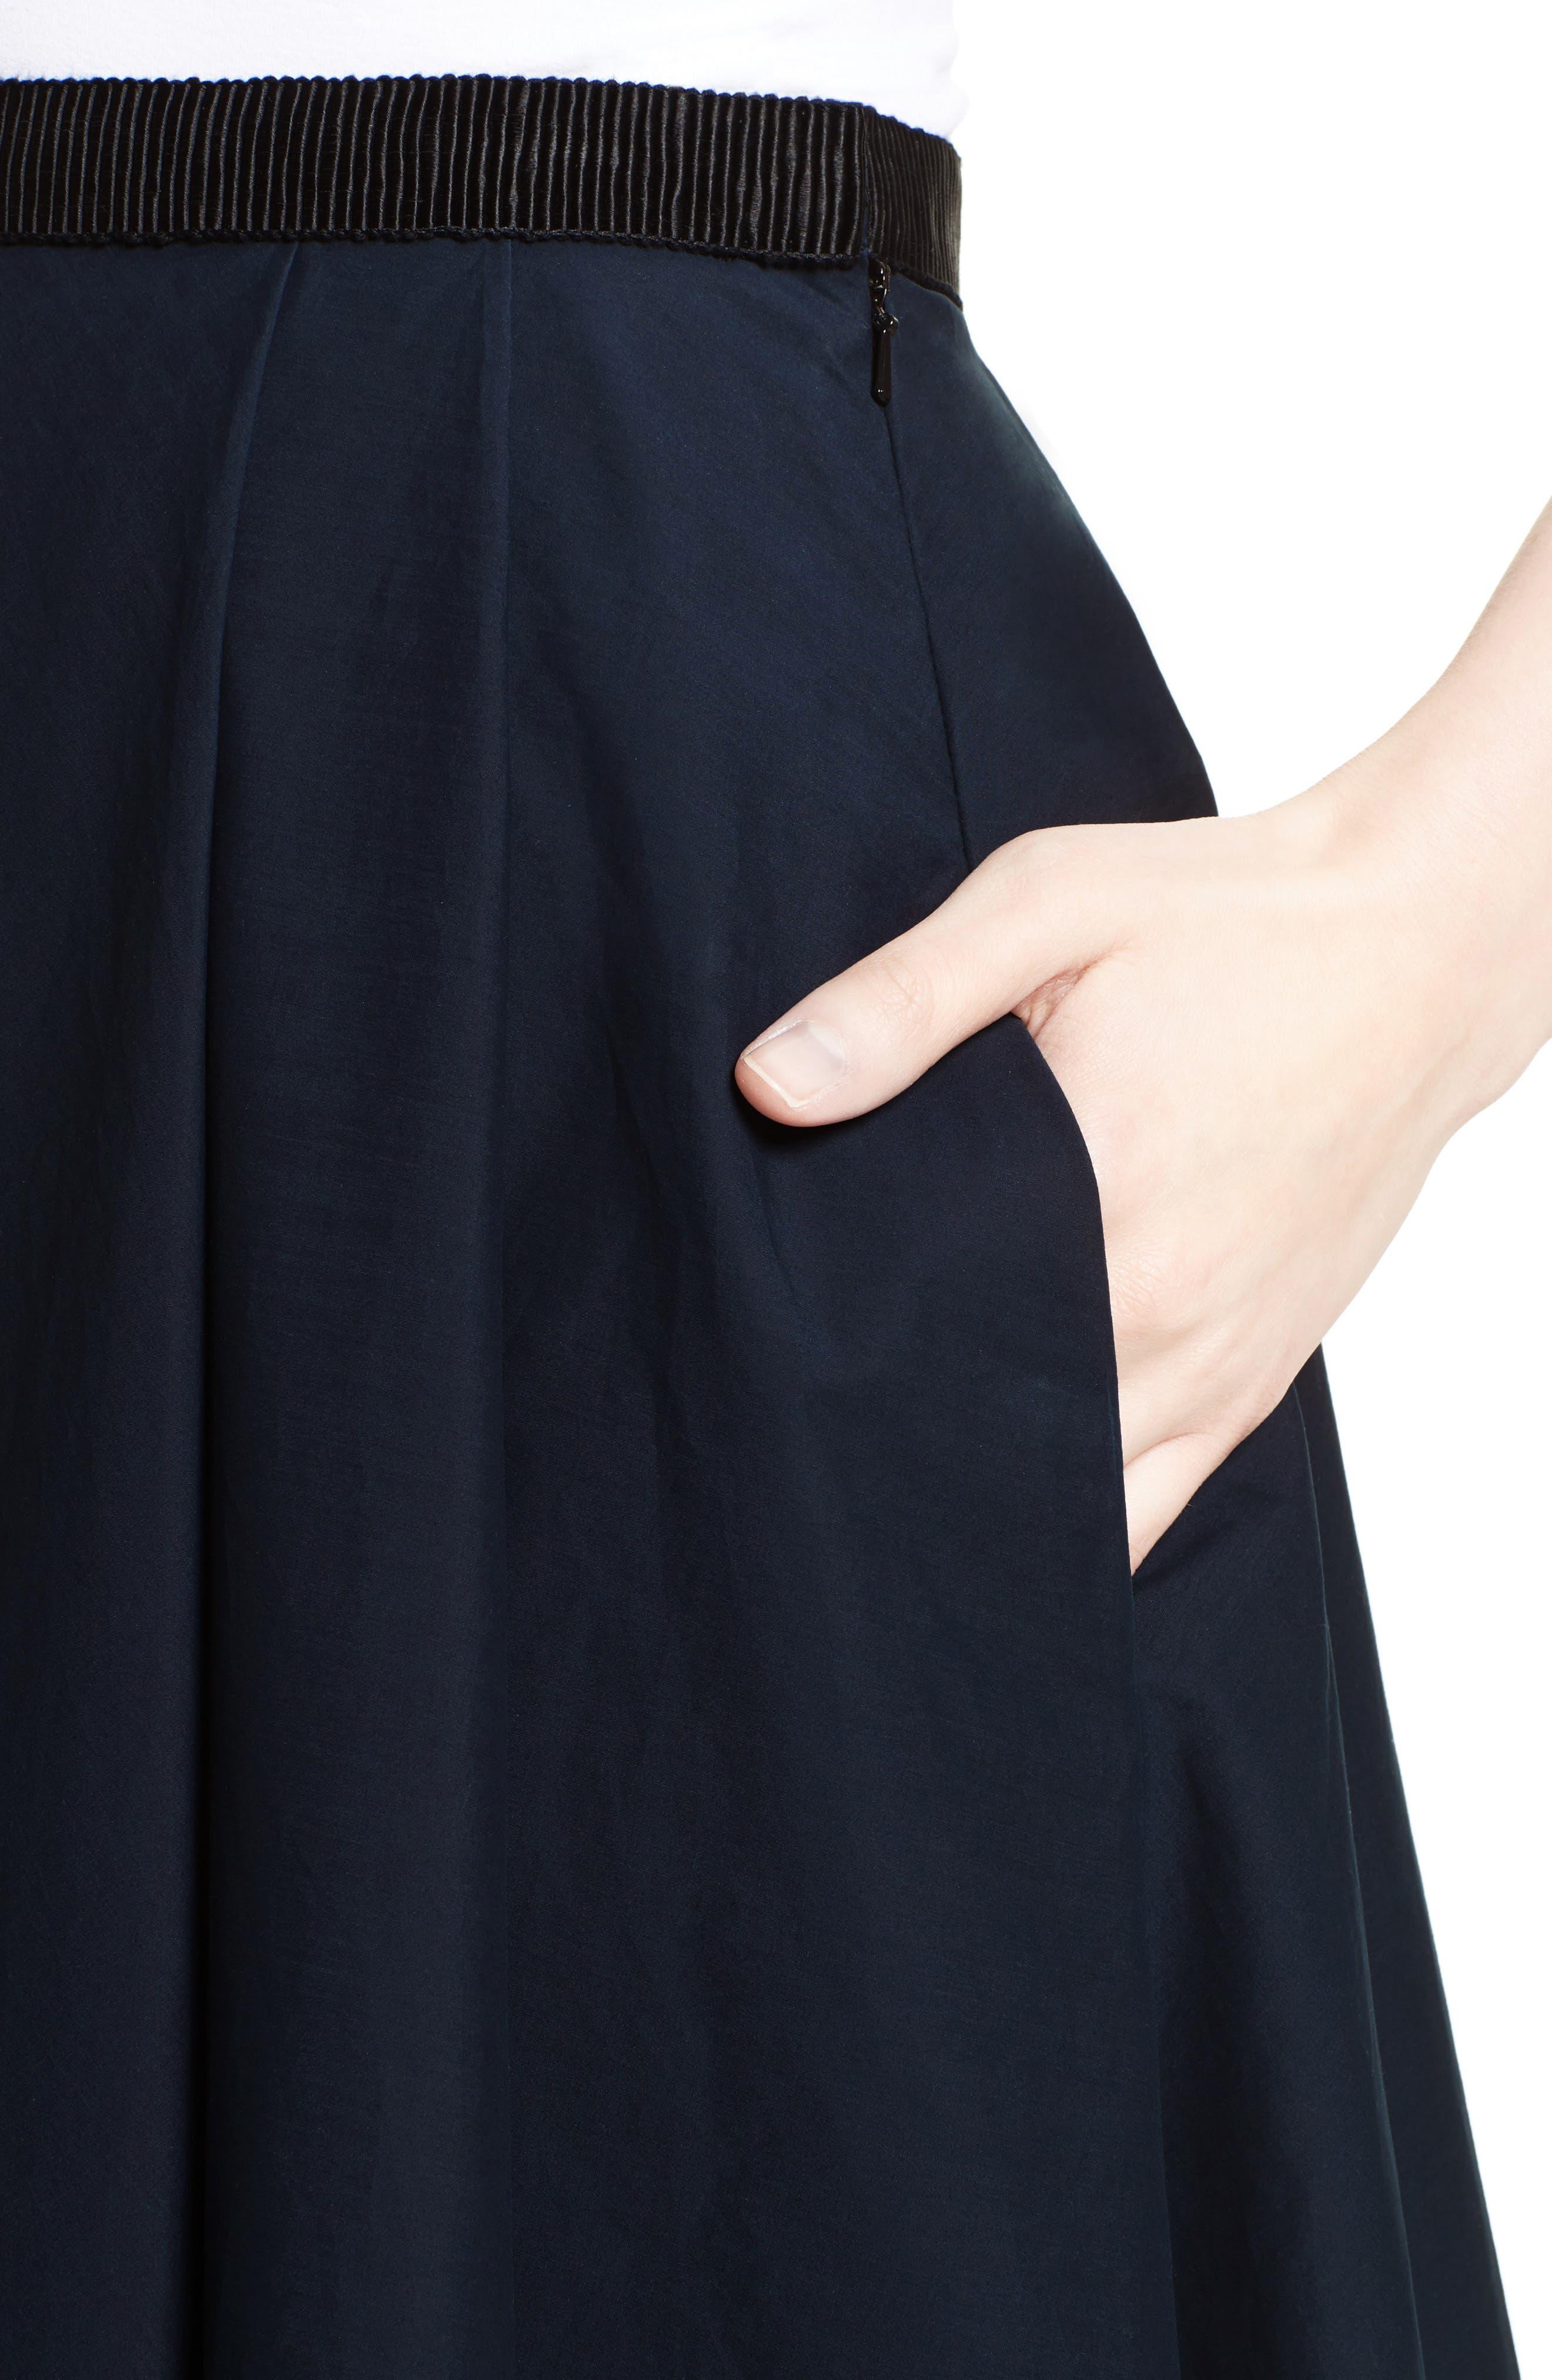 Ruffle Cotton A-Line Skirt,                             Alternate thumbnail 5, color,                             Navy